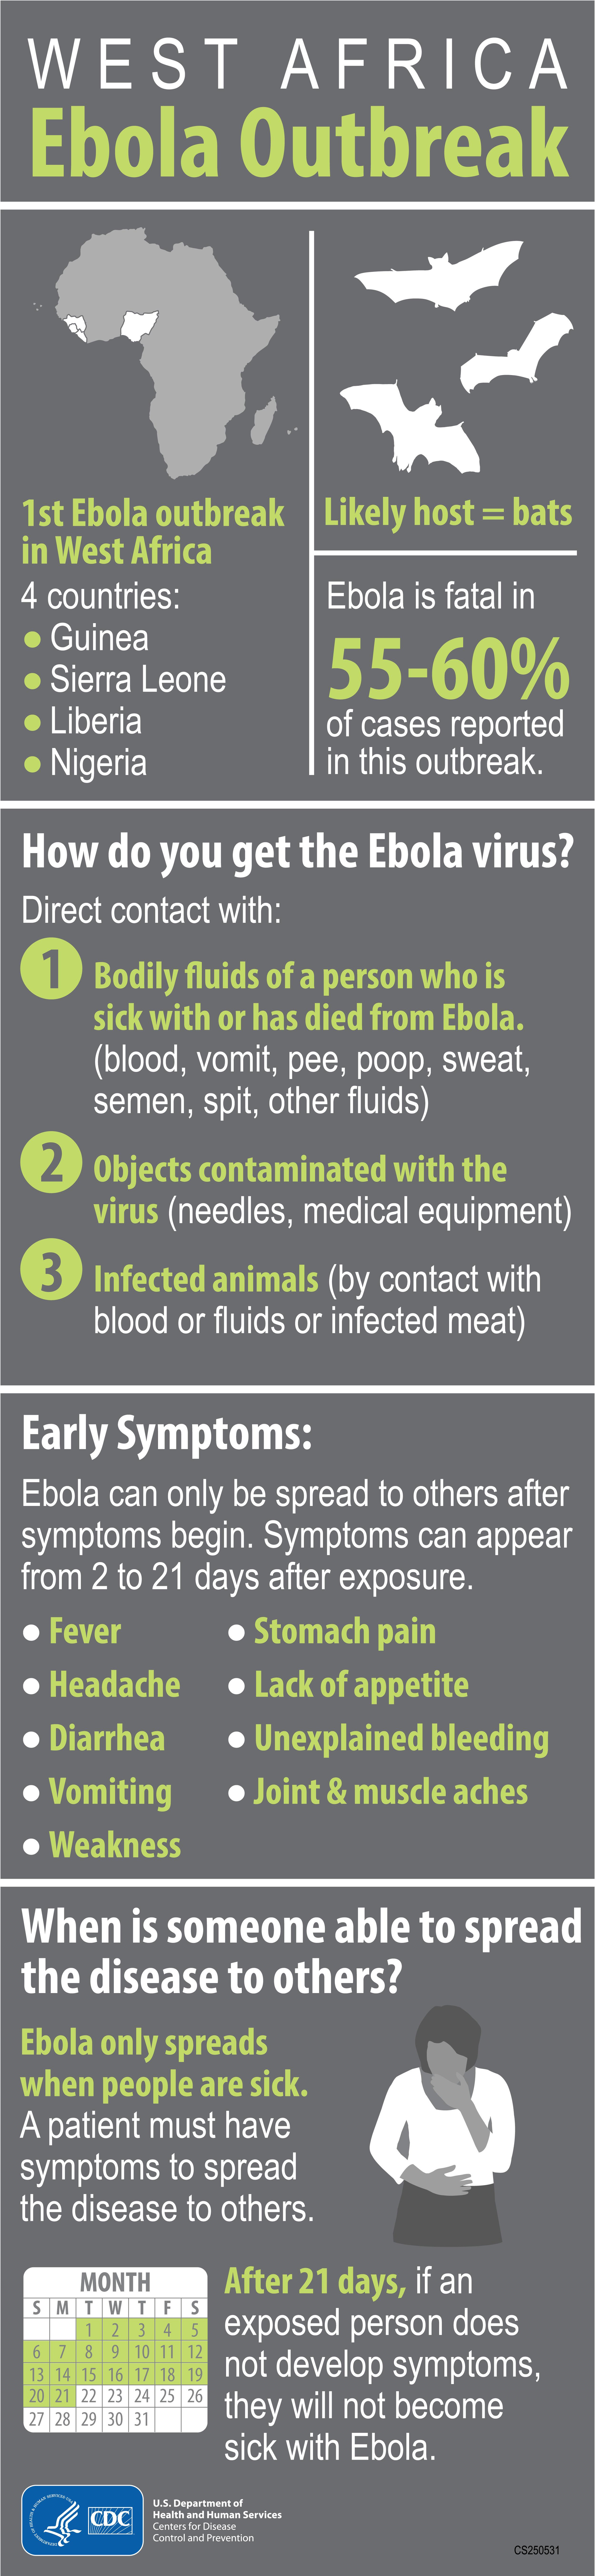 2014 West Africa Ebola Outbreak